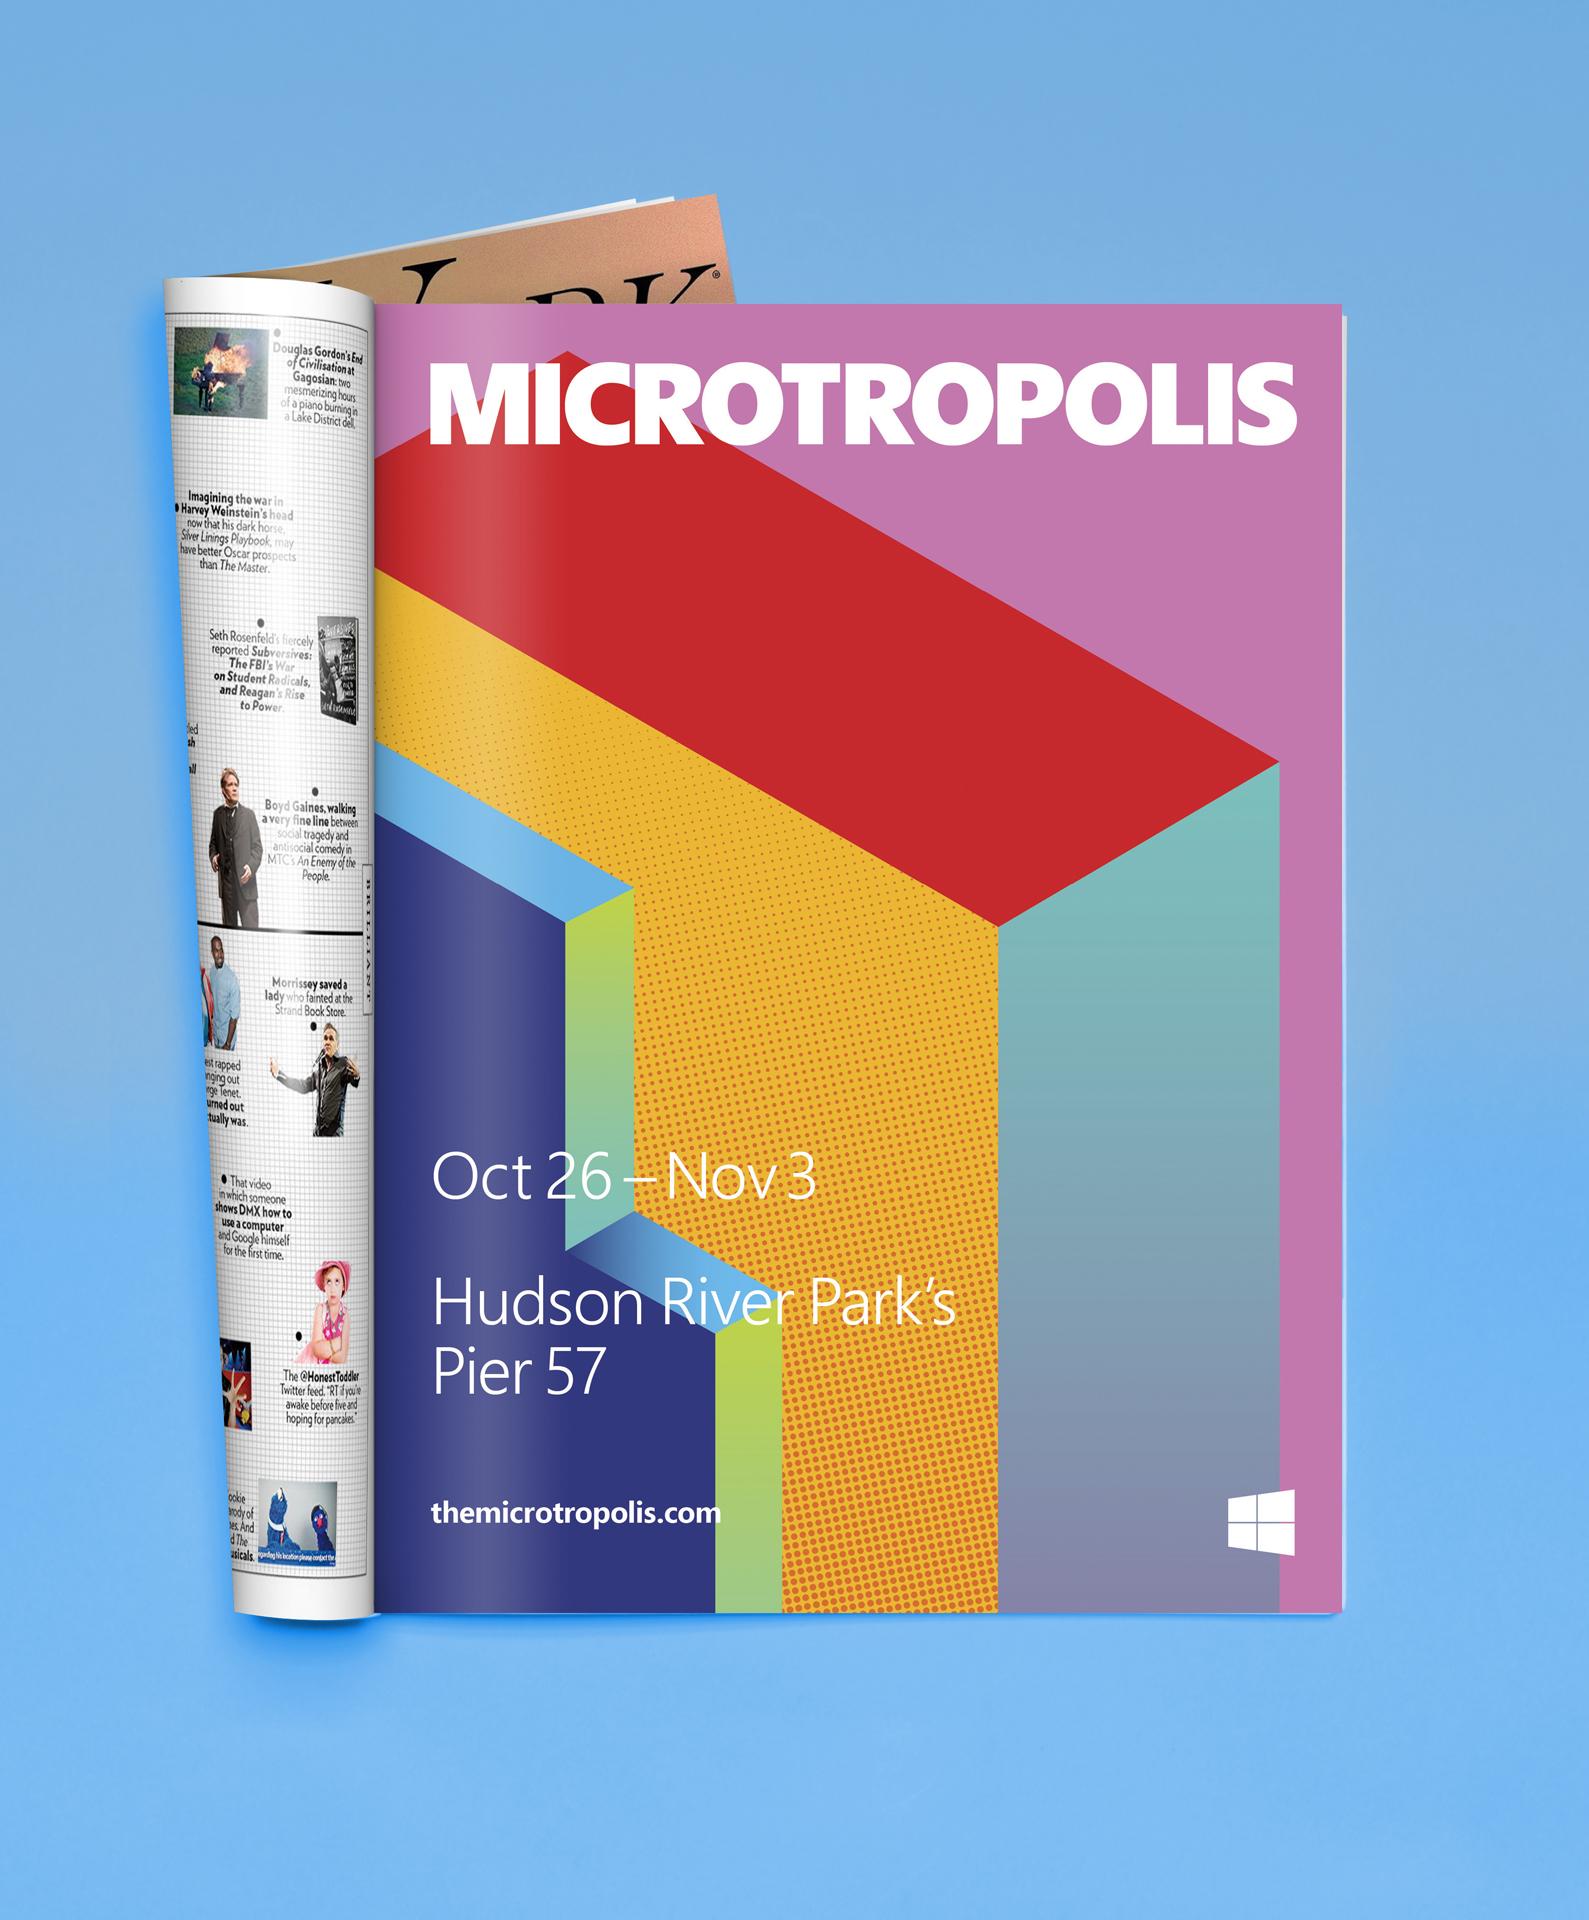 MotherDesign_Microsoft_Microtropolis32.jpg